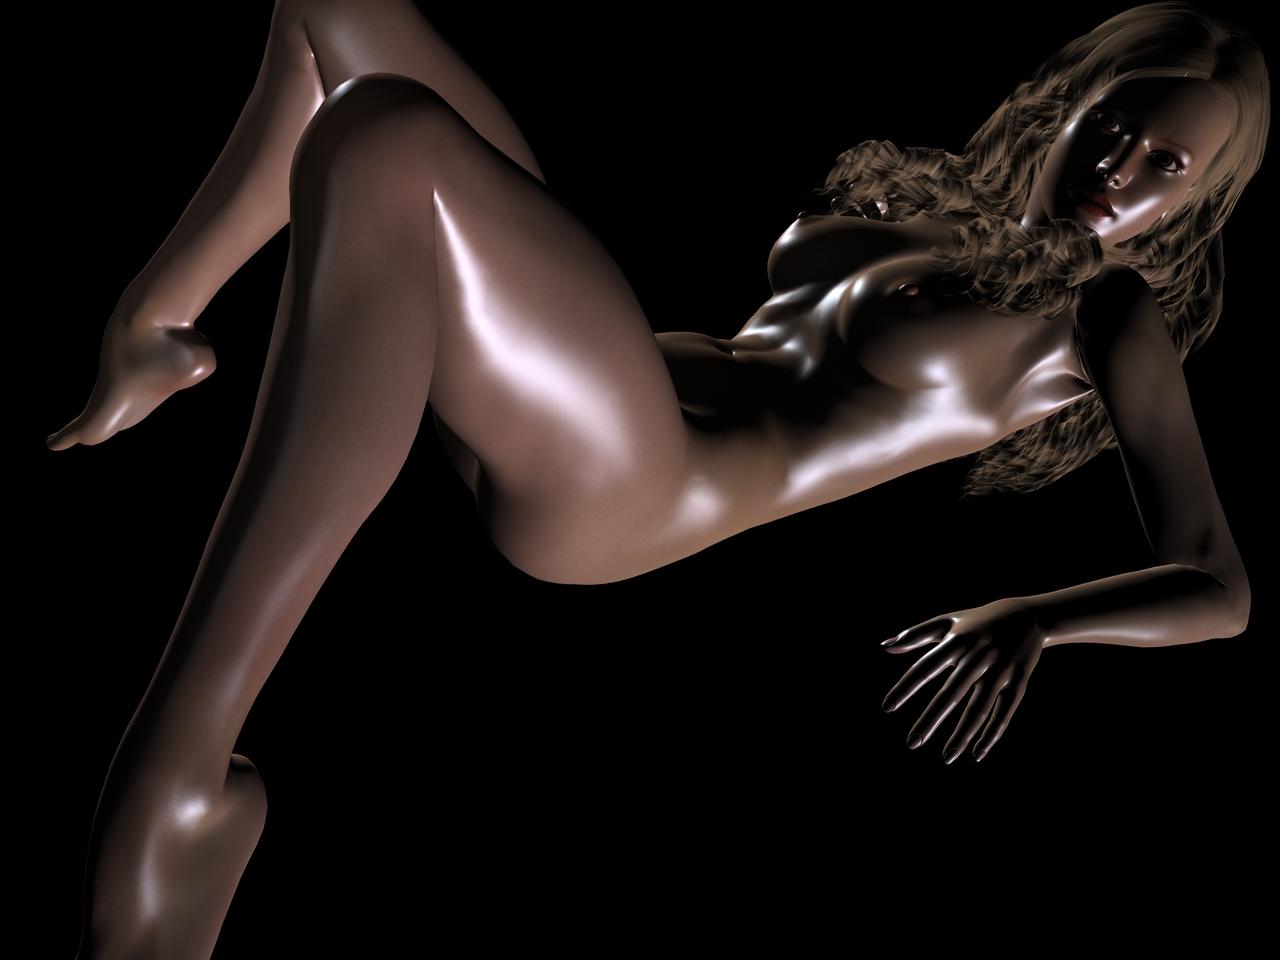 nude women from romania